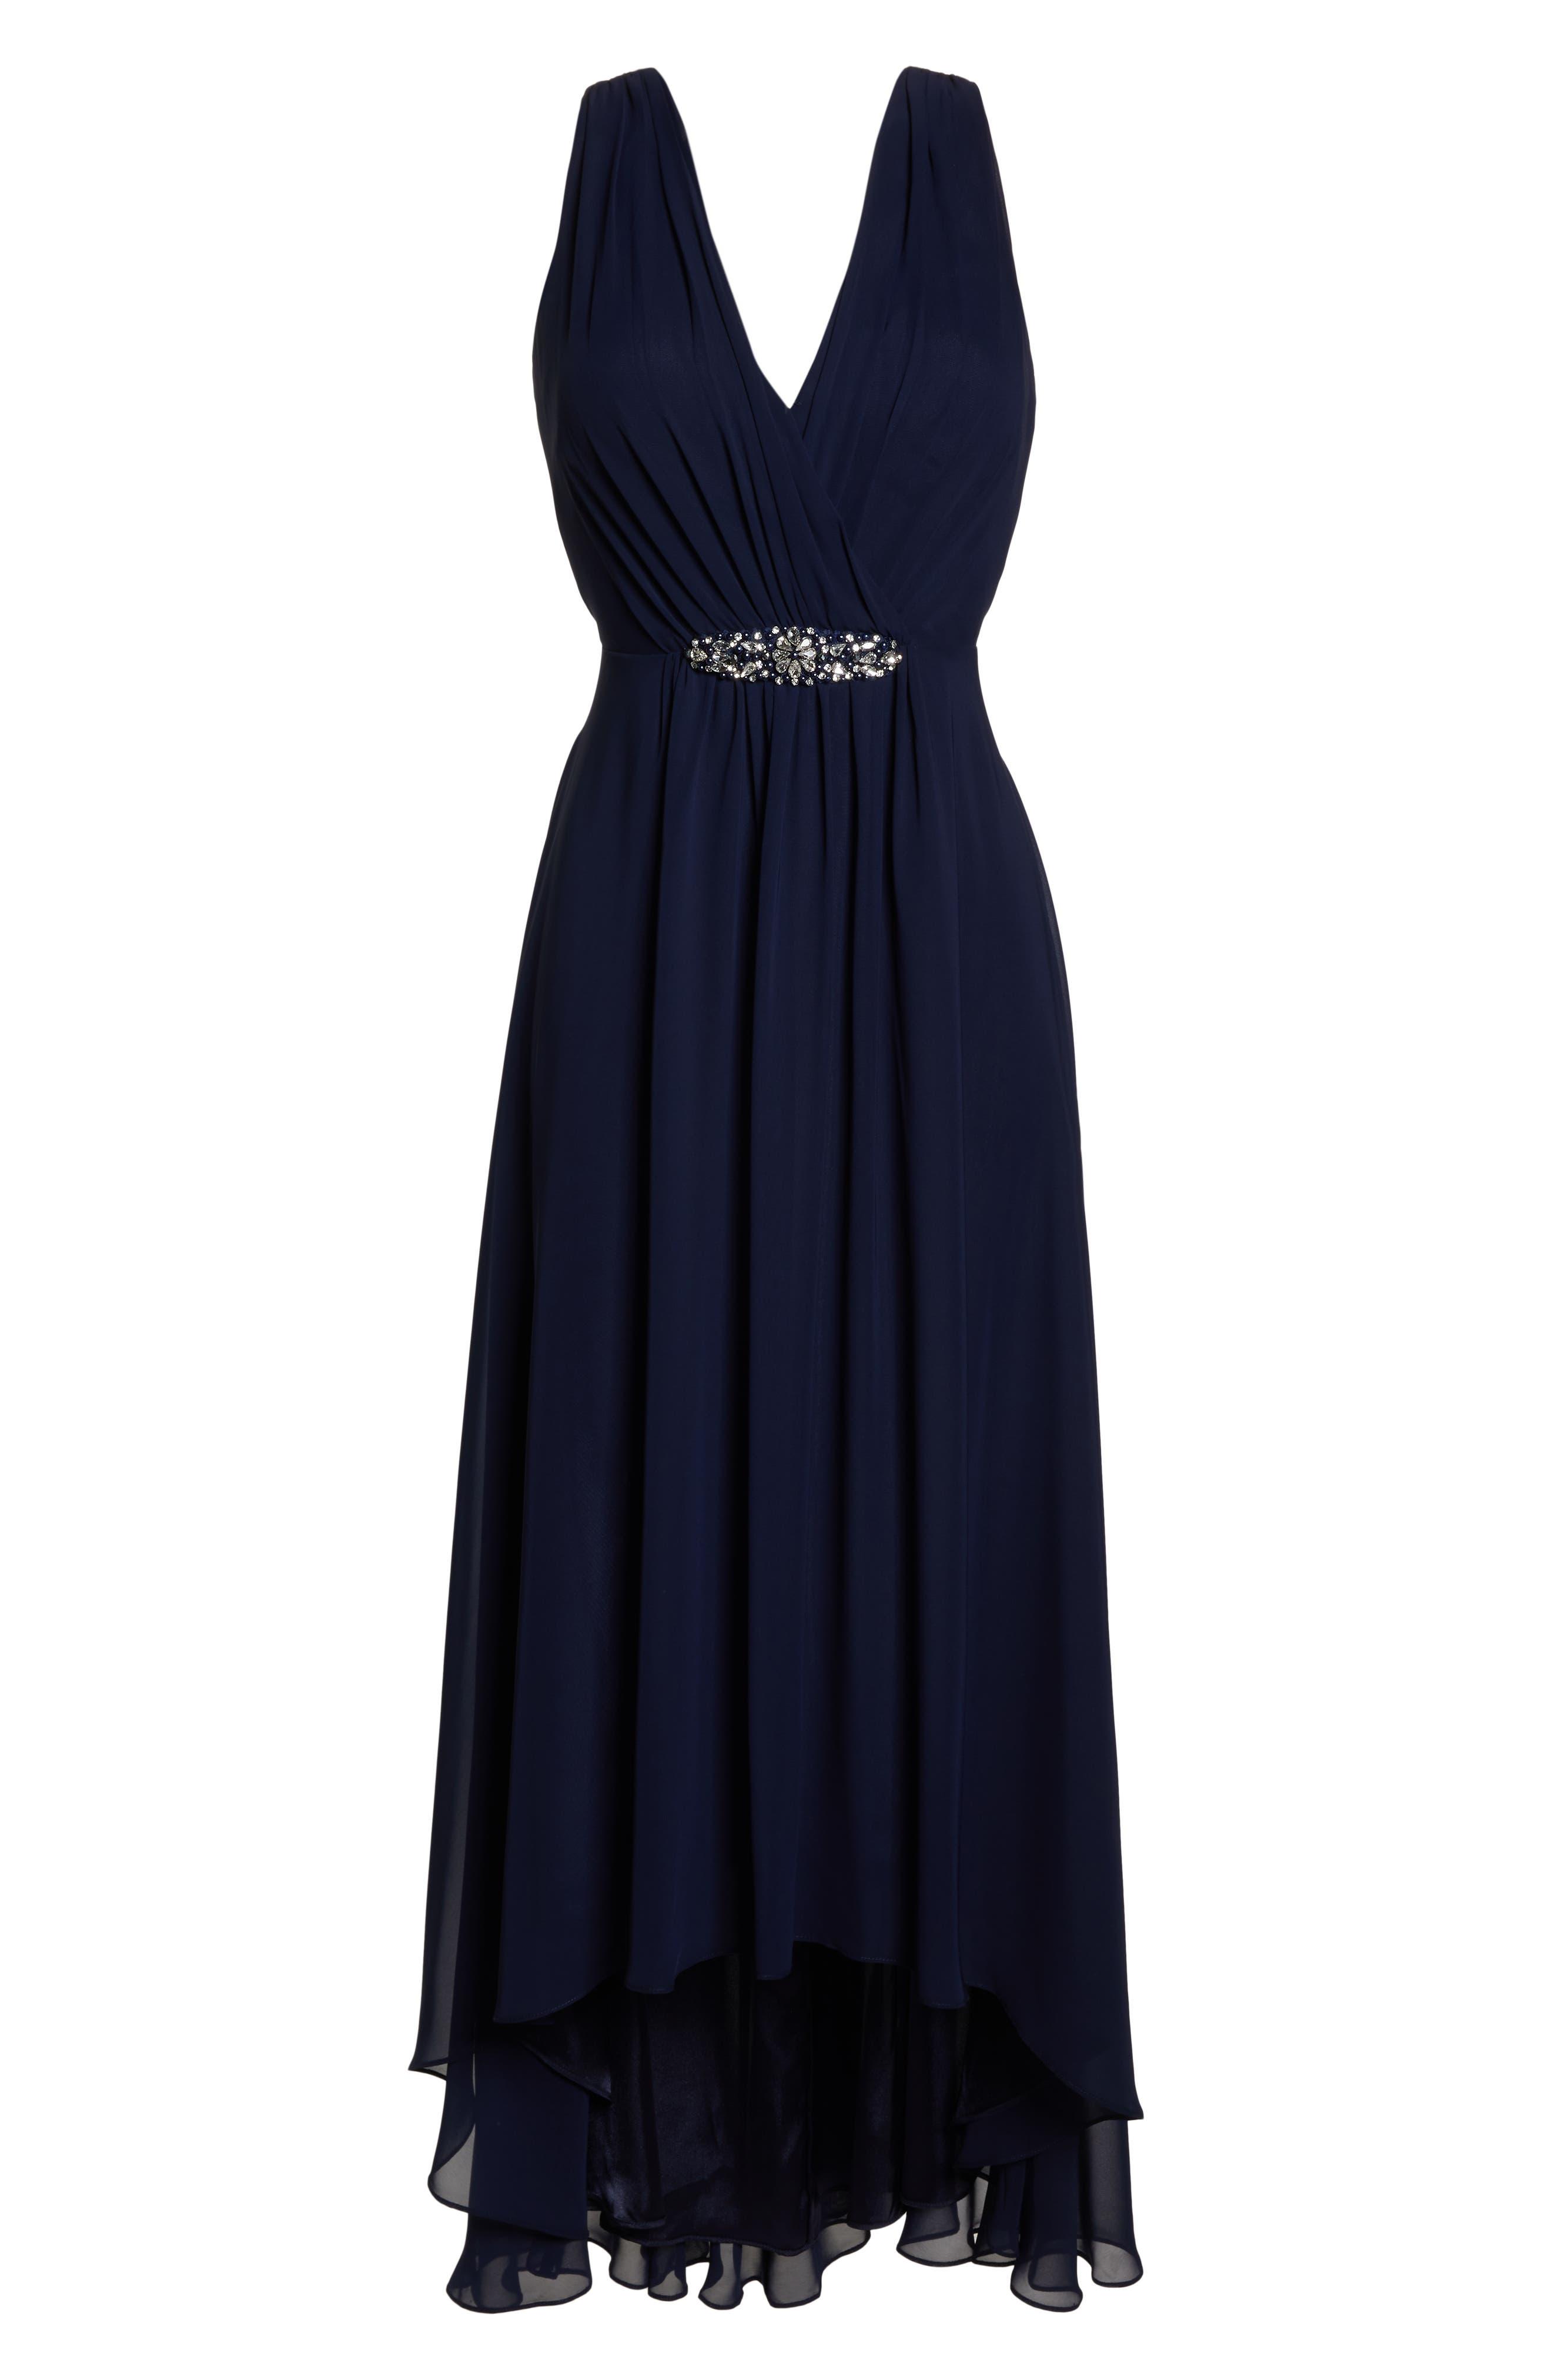 ELIZA J, Wrap Look High/Low Chiffon Dress, Alternate thumbnail 7, color, NAVY